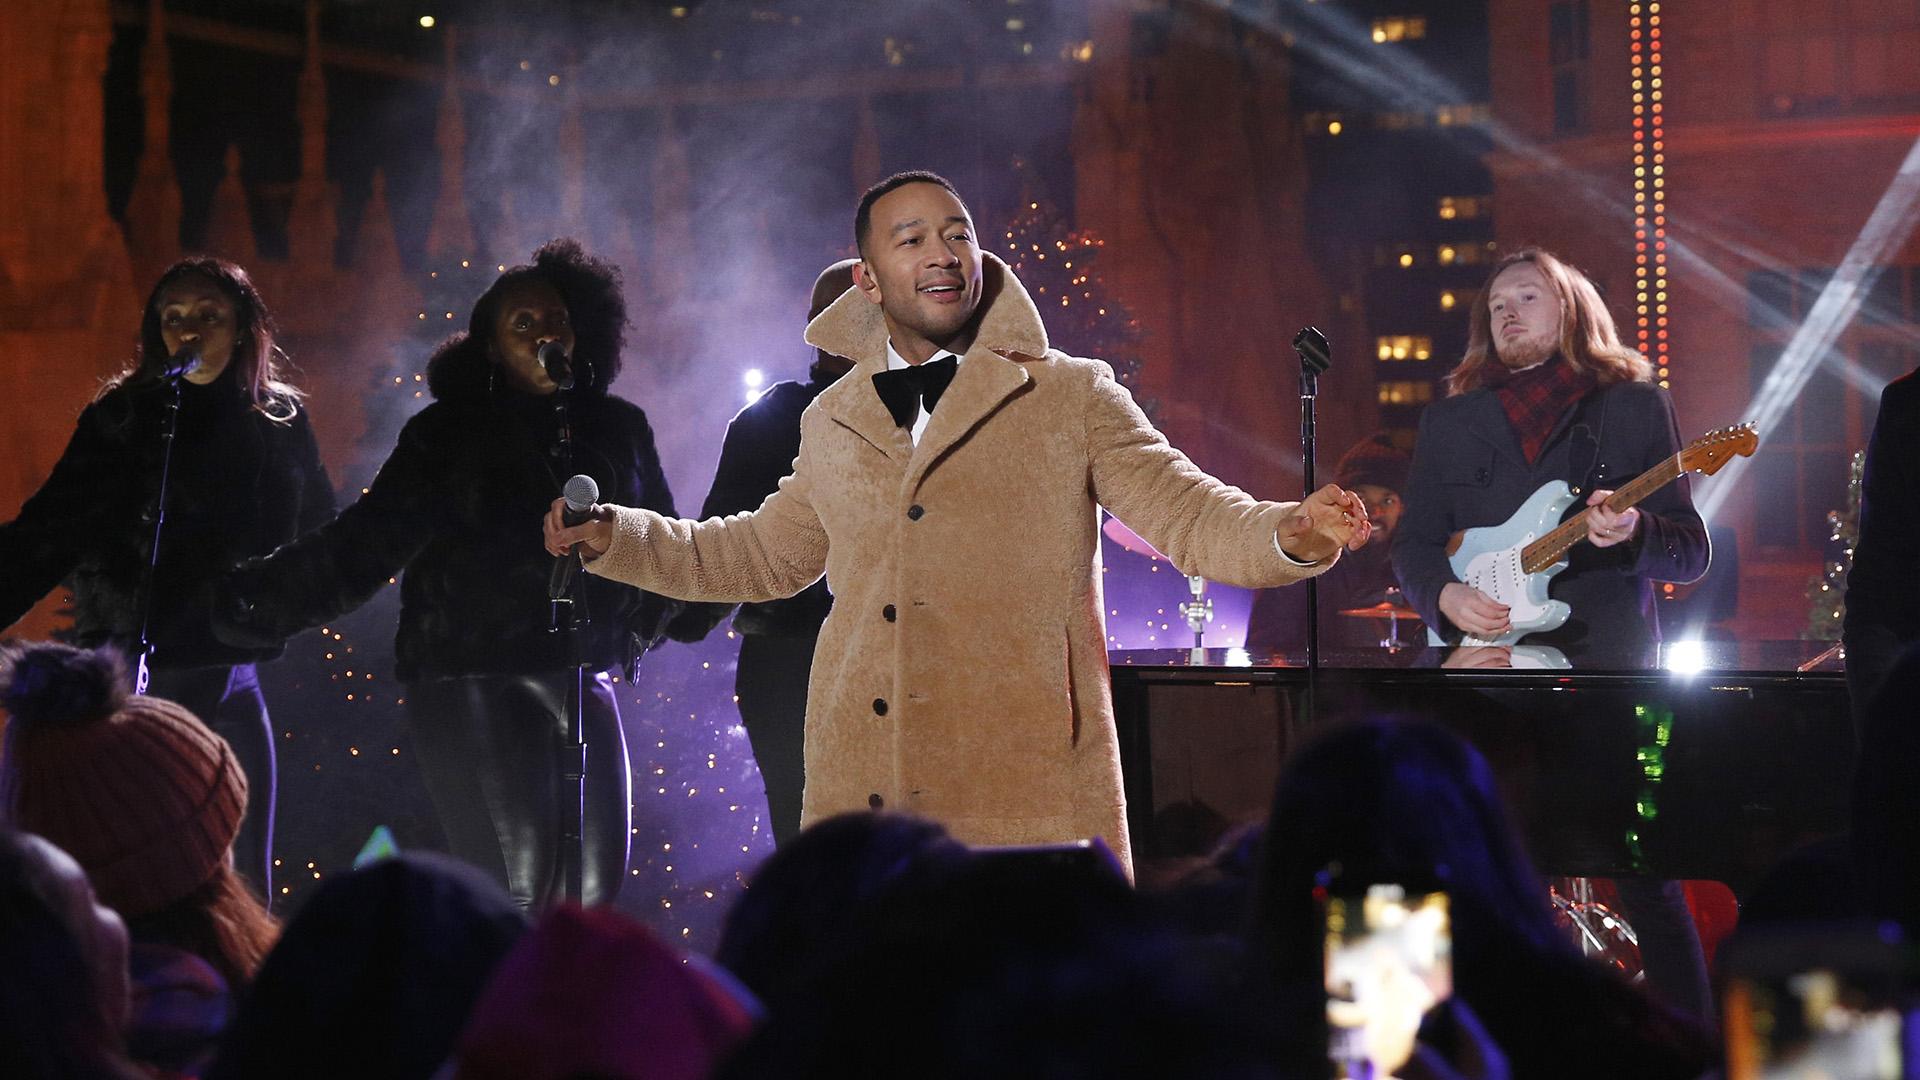 Ben Eunson performing with John Legend on NBC, 2018